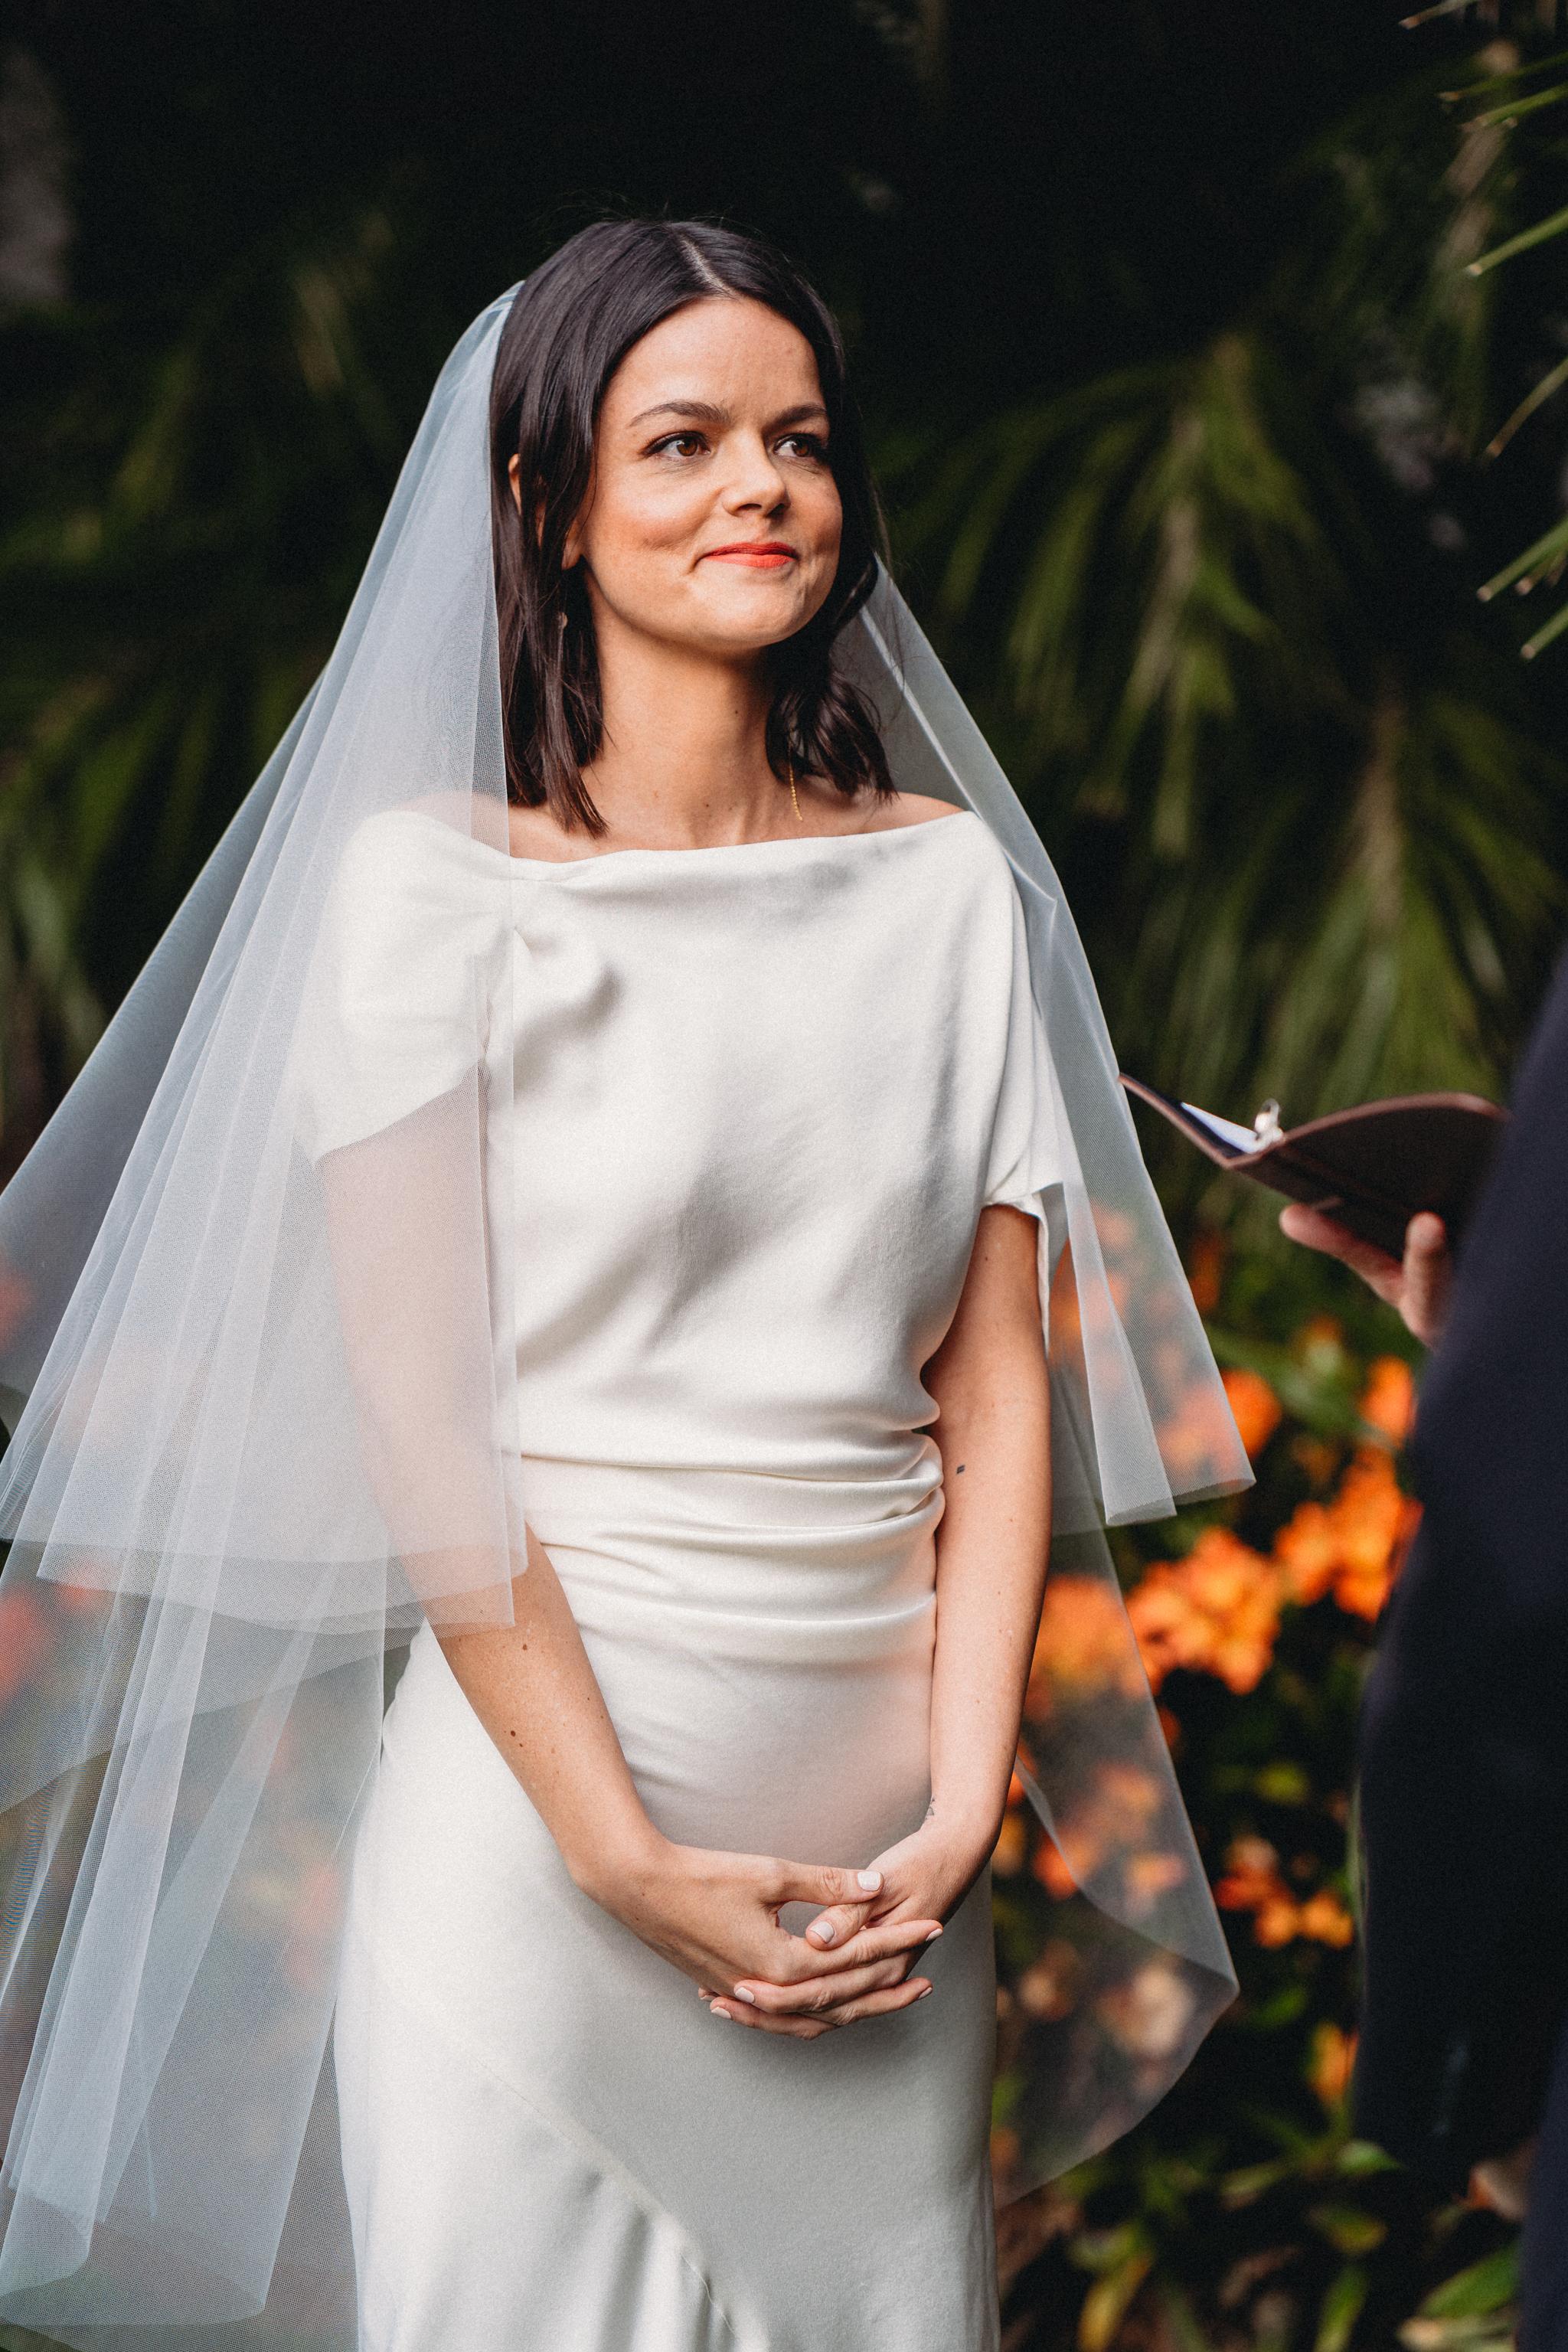 wedding-photography-santa-barbara-courthouse-rebeccaylasotras-53.jpg